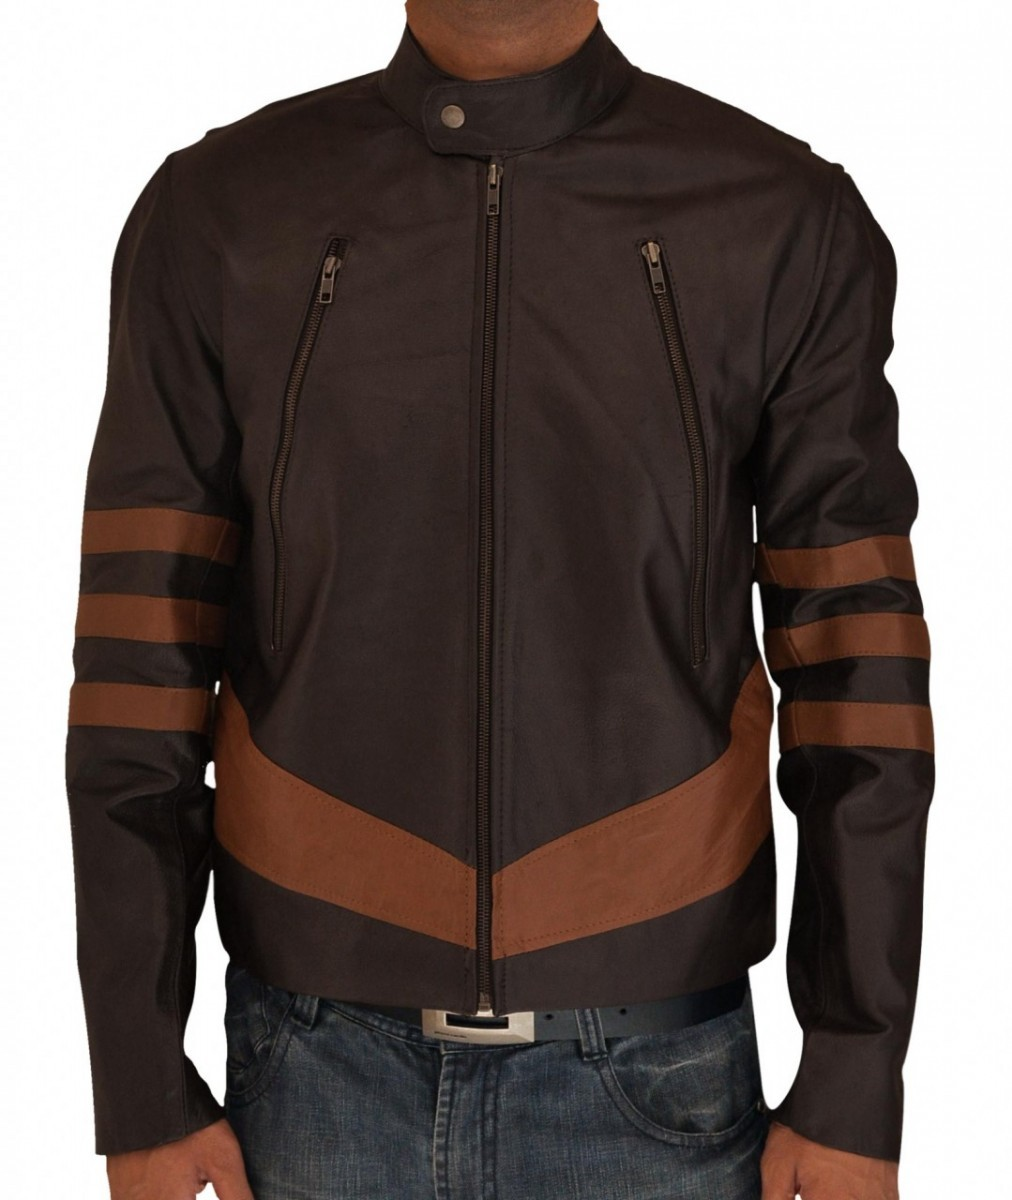 X Men Wolverine Logans Brown Leather Jacket